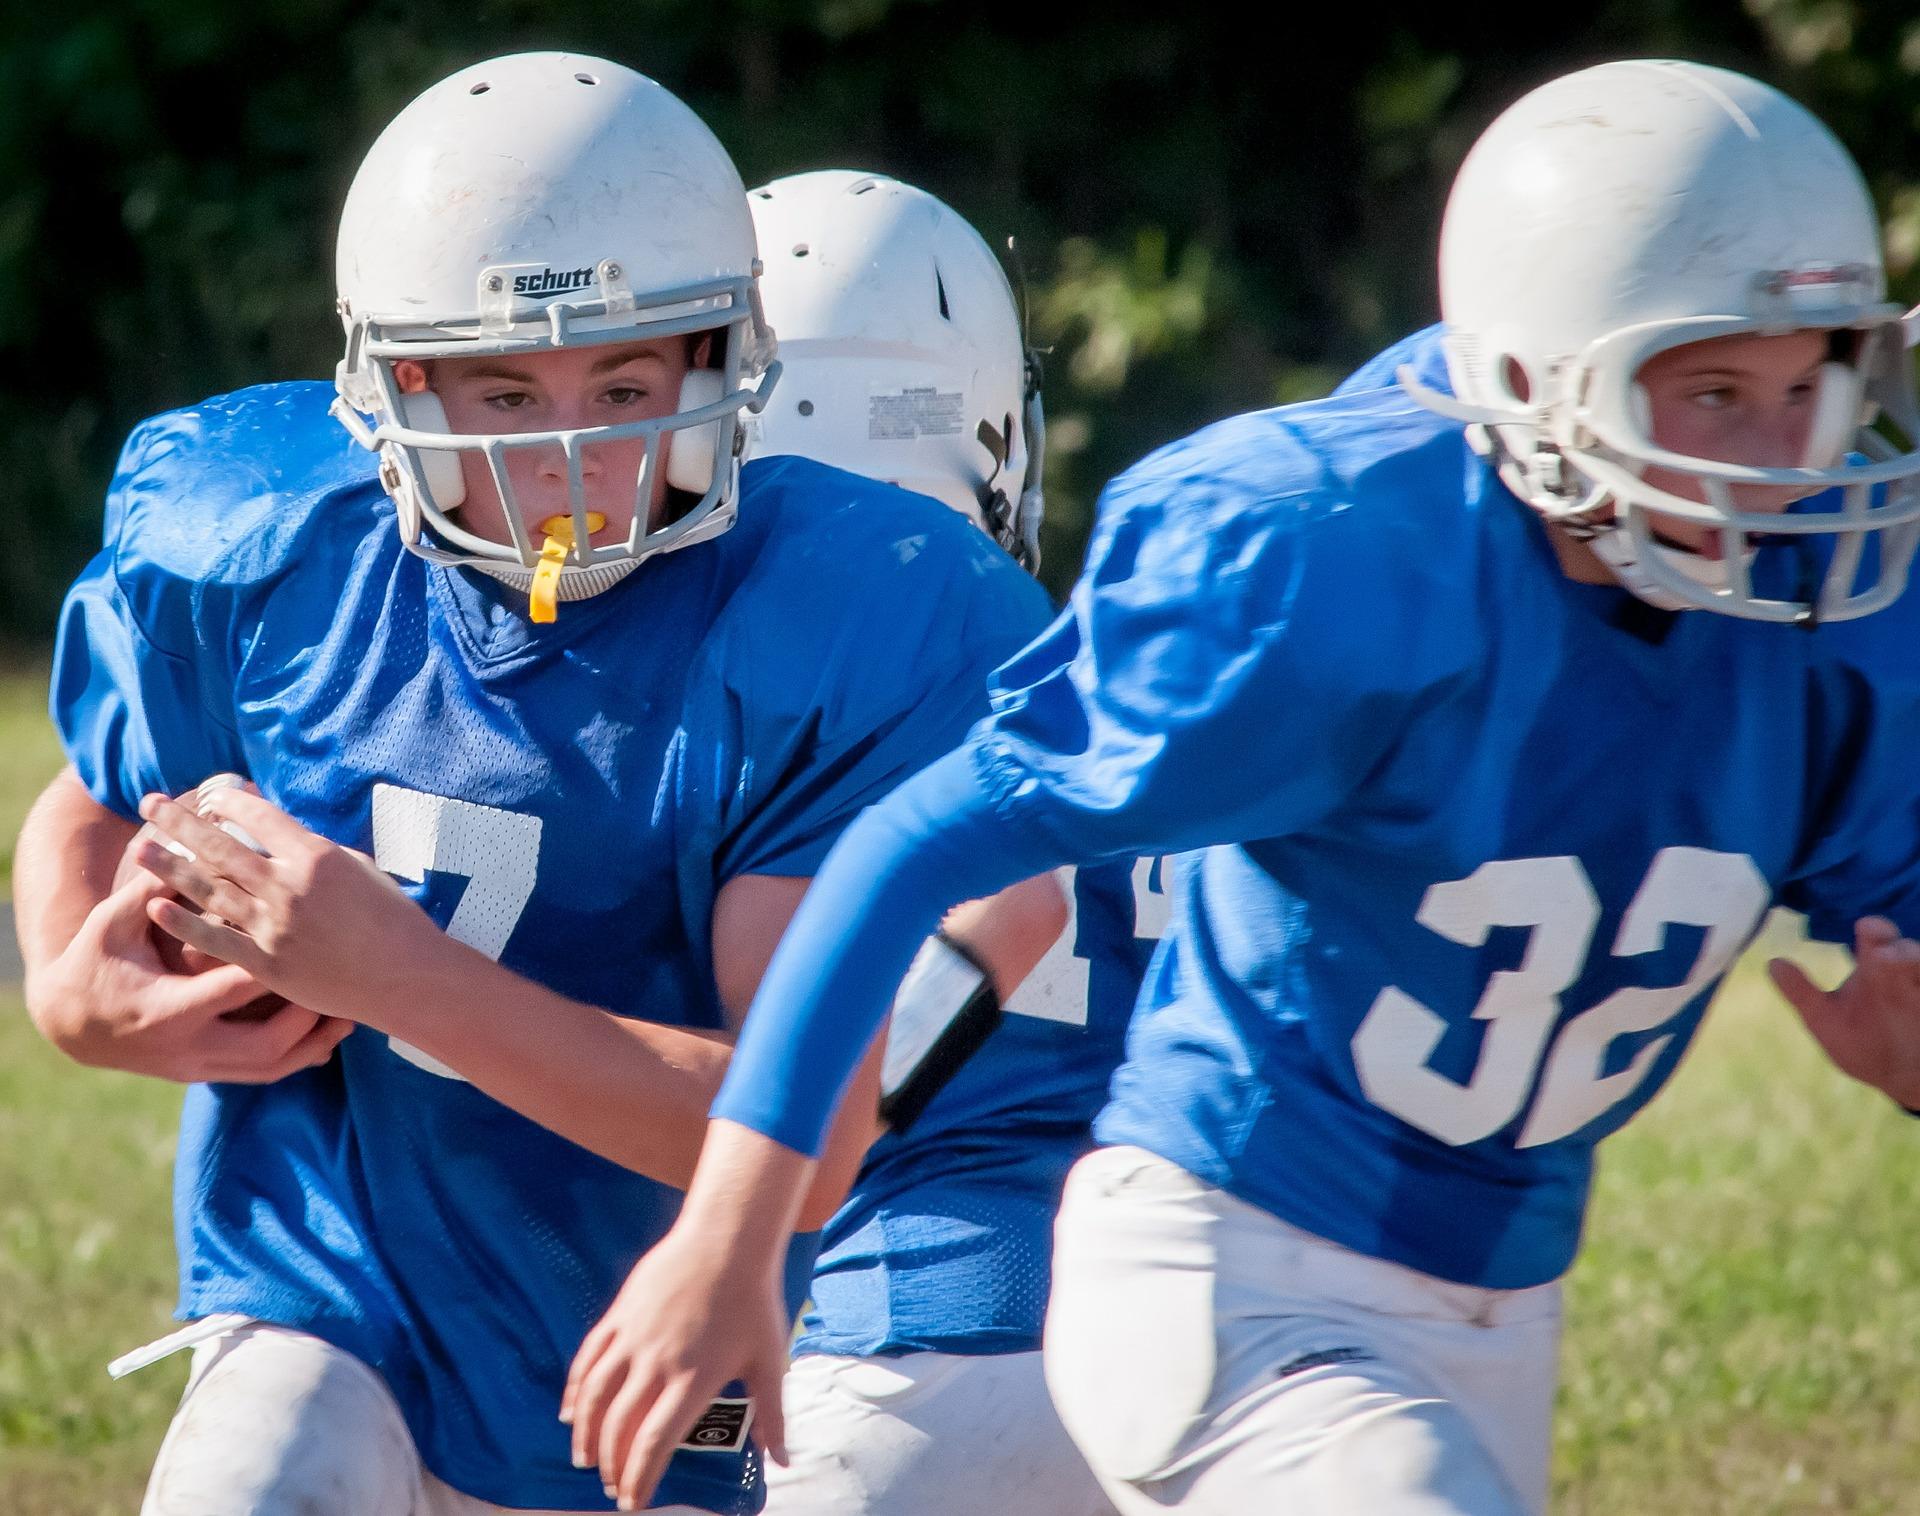 Young football players wearing blue jerseys playing football